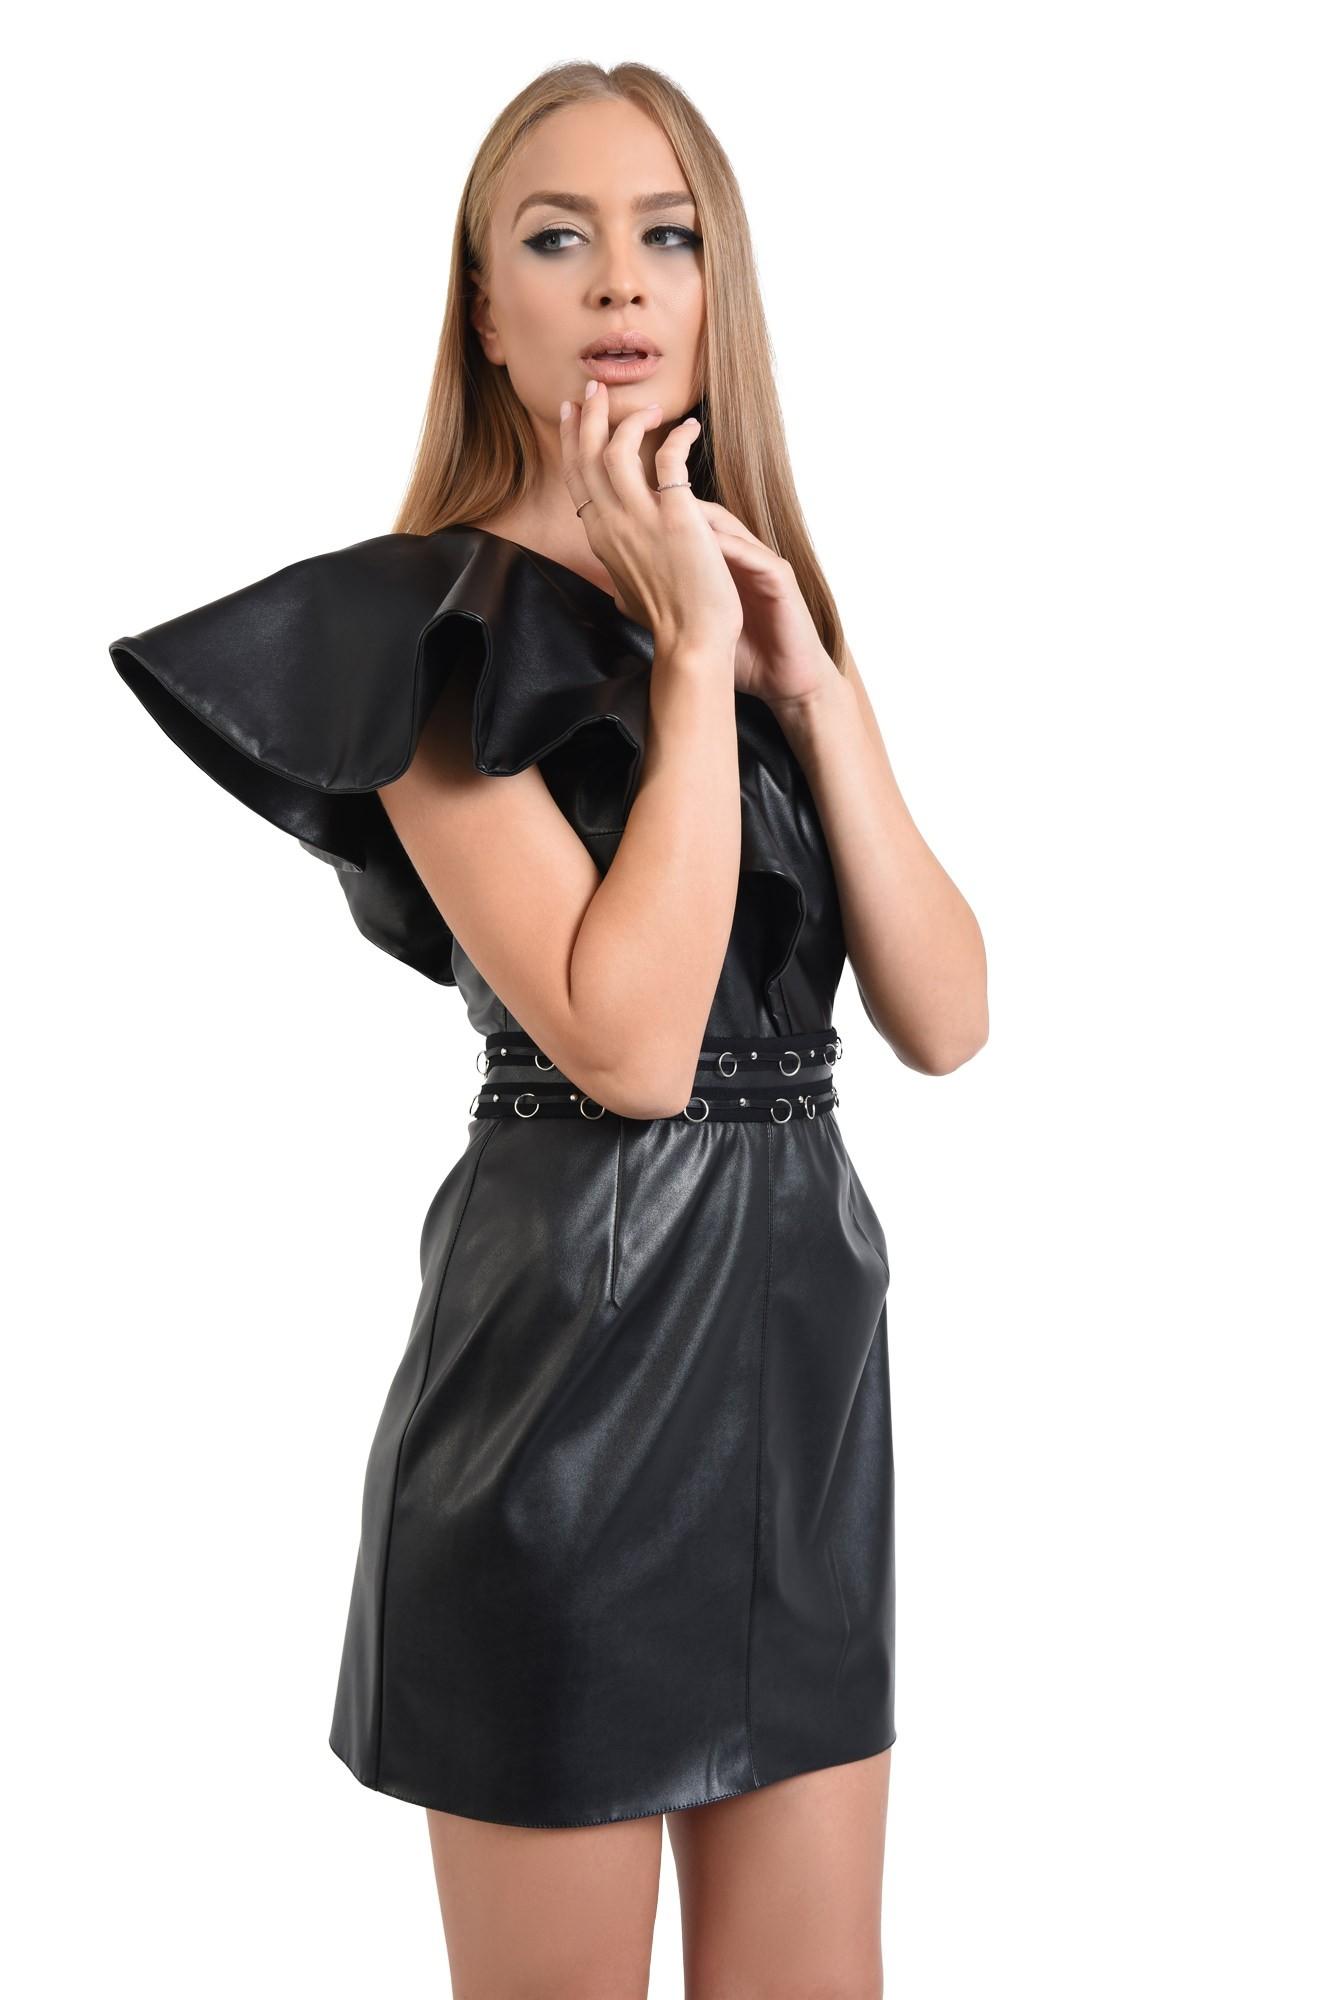 0 - rochie neagra, piele ecologica, volan supradimensionat, decolteu asimetric